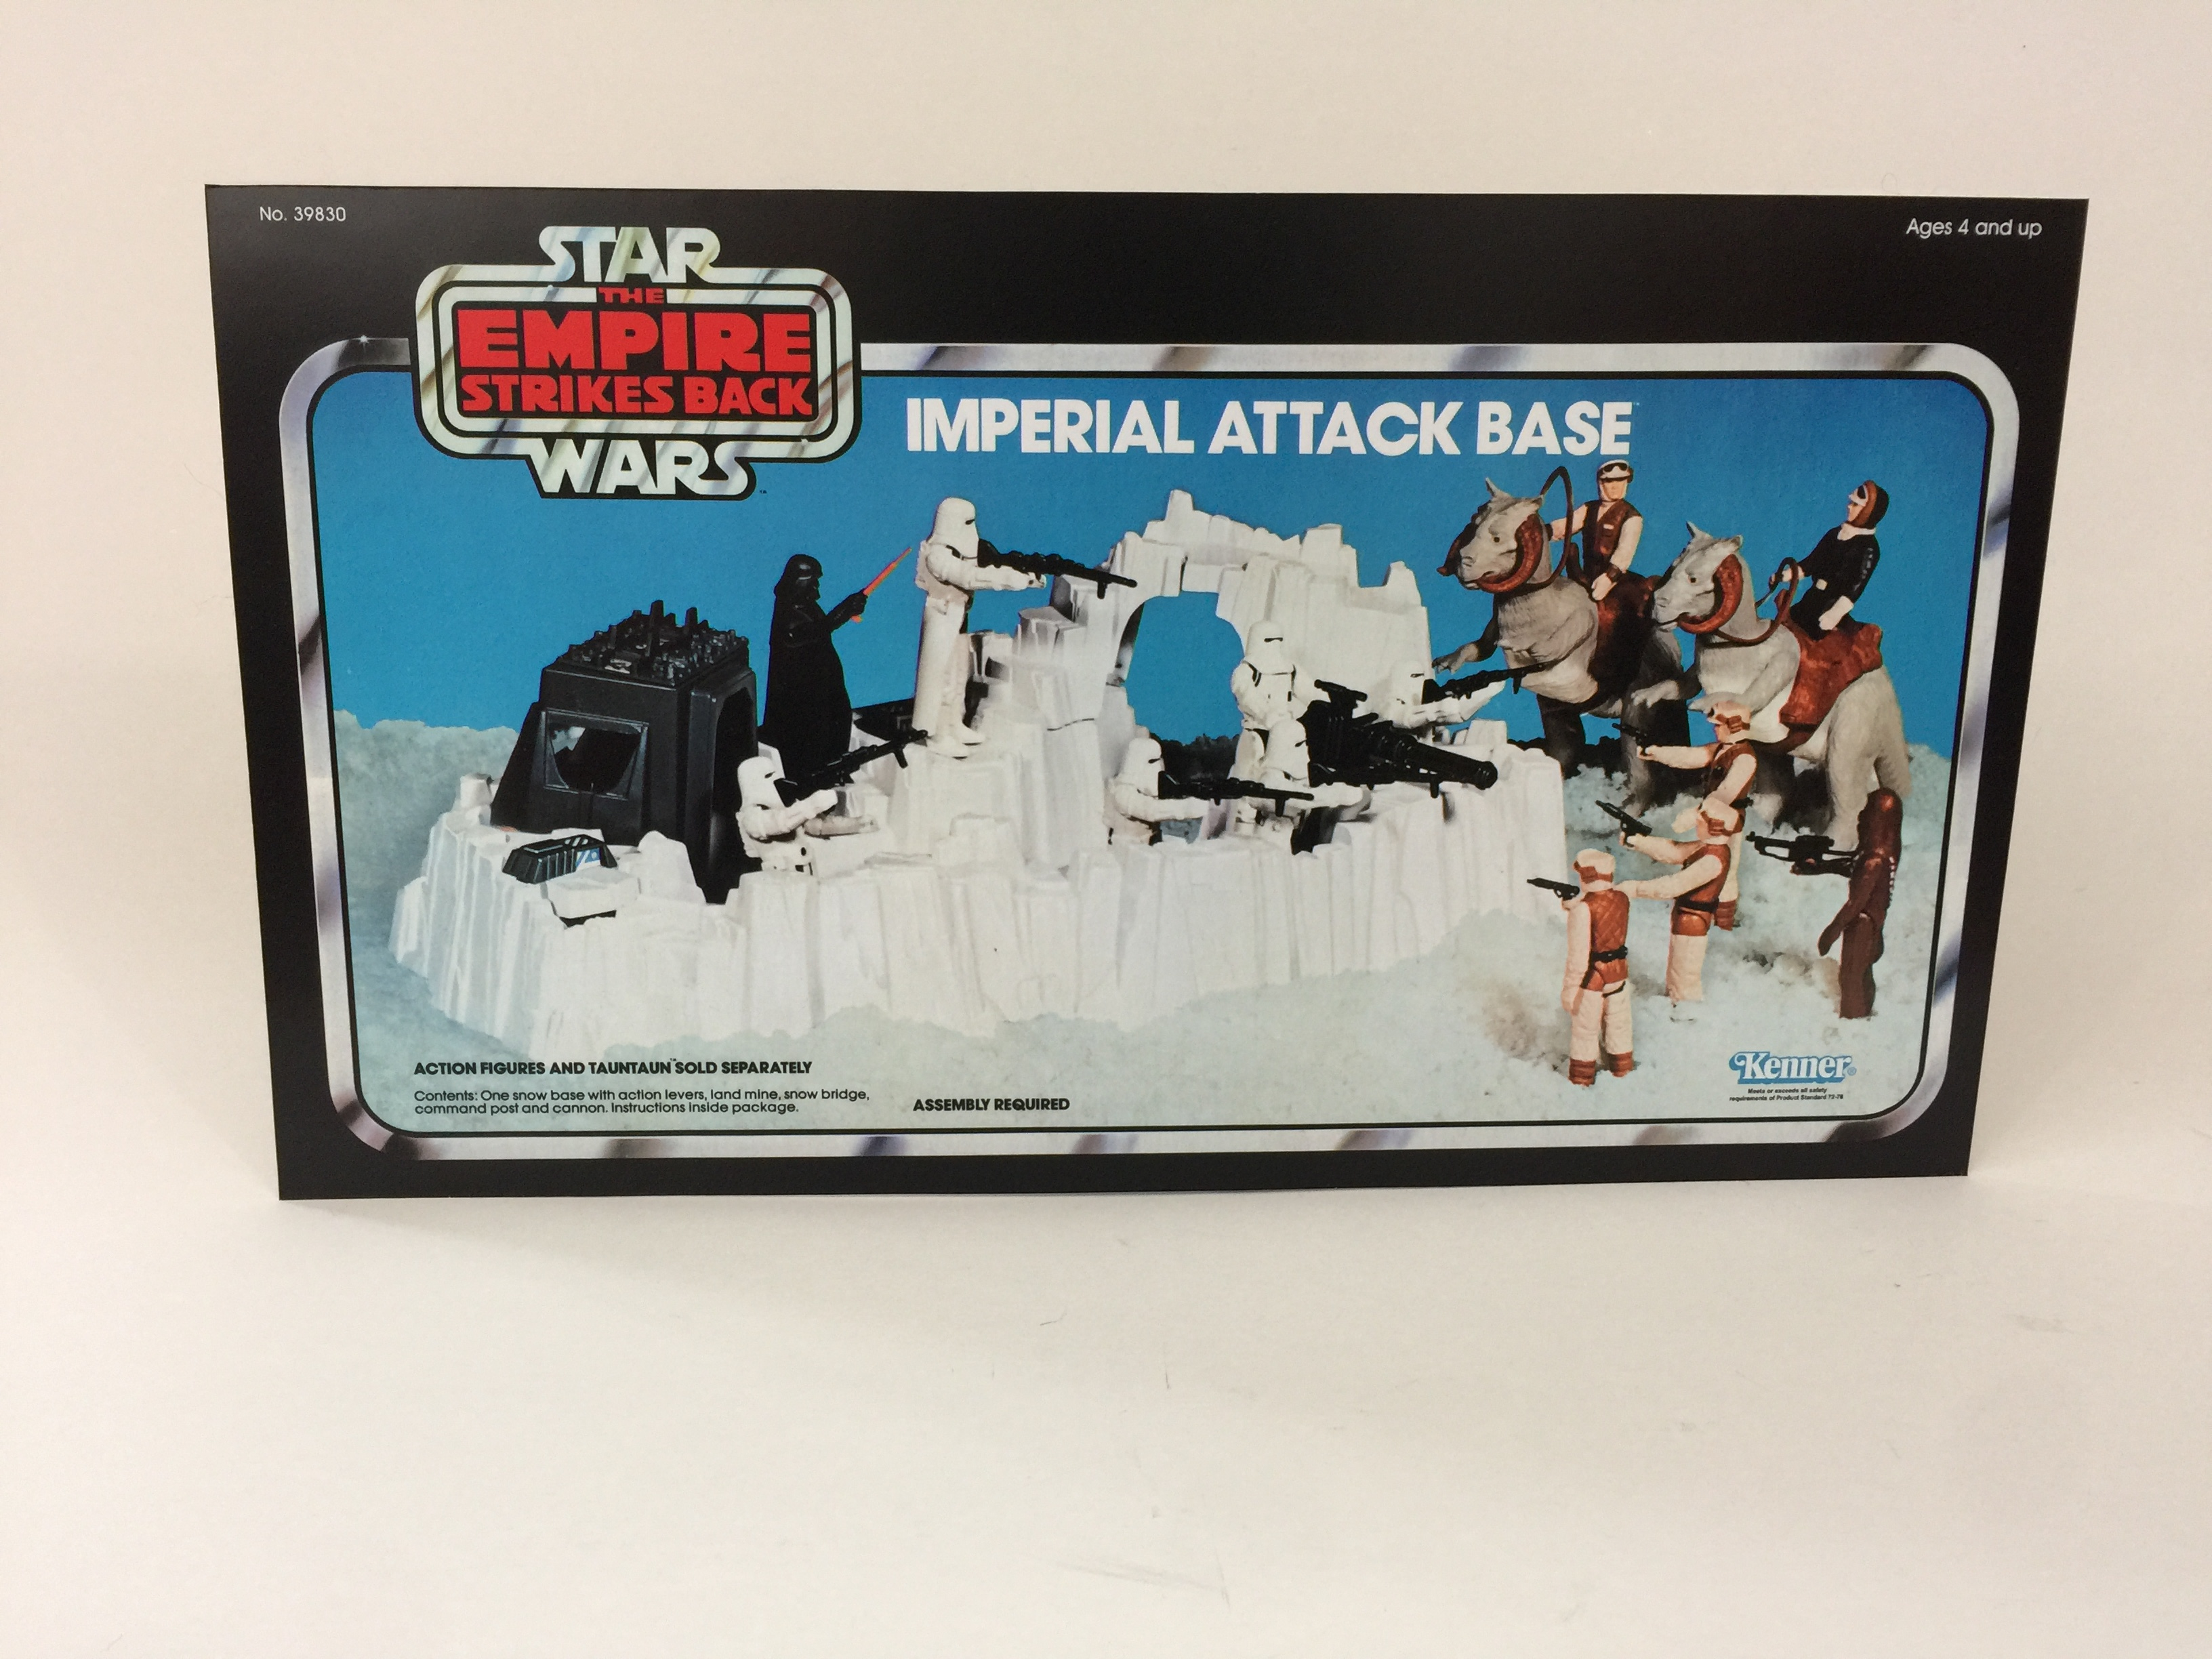 Vintage Star Wars Imperial Attack Base Blue Boxes Lot Part 1980 1 set Details about  /